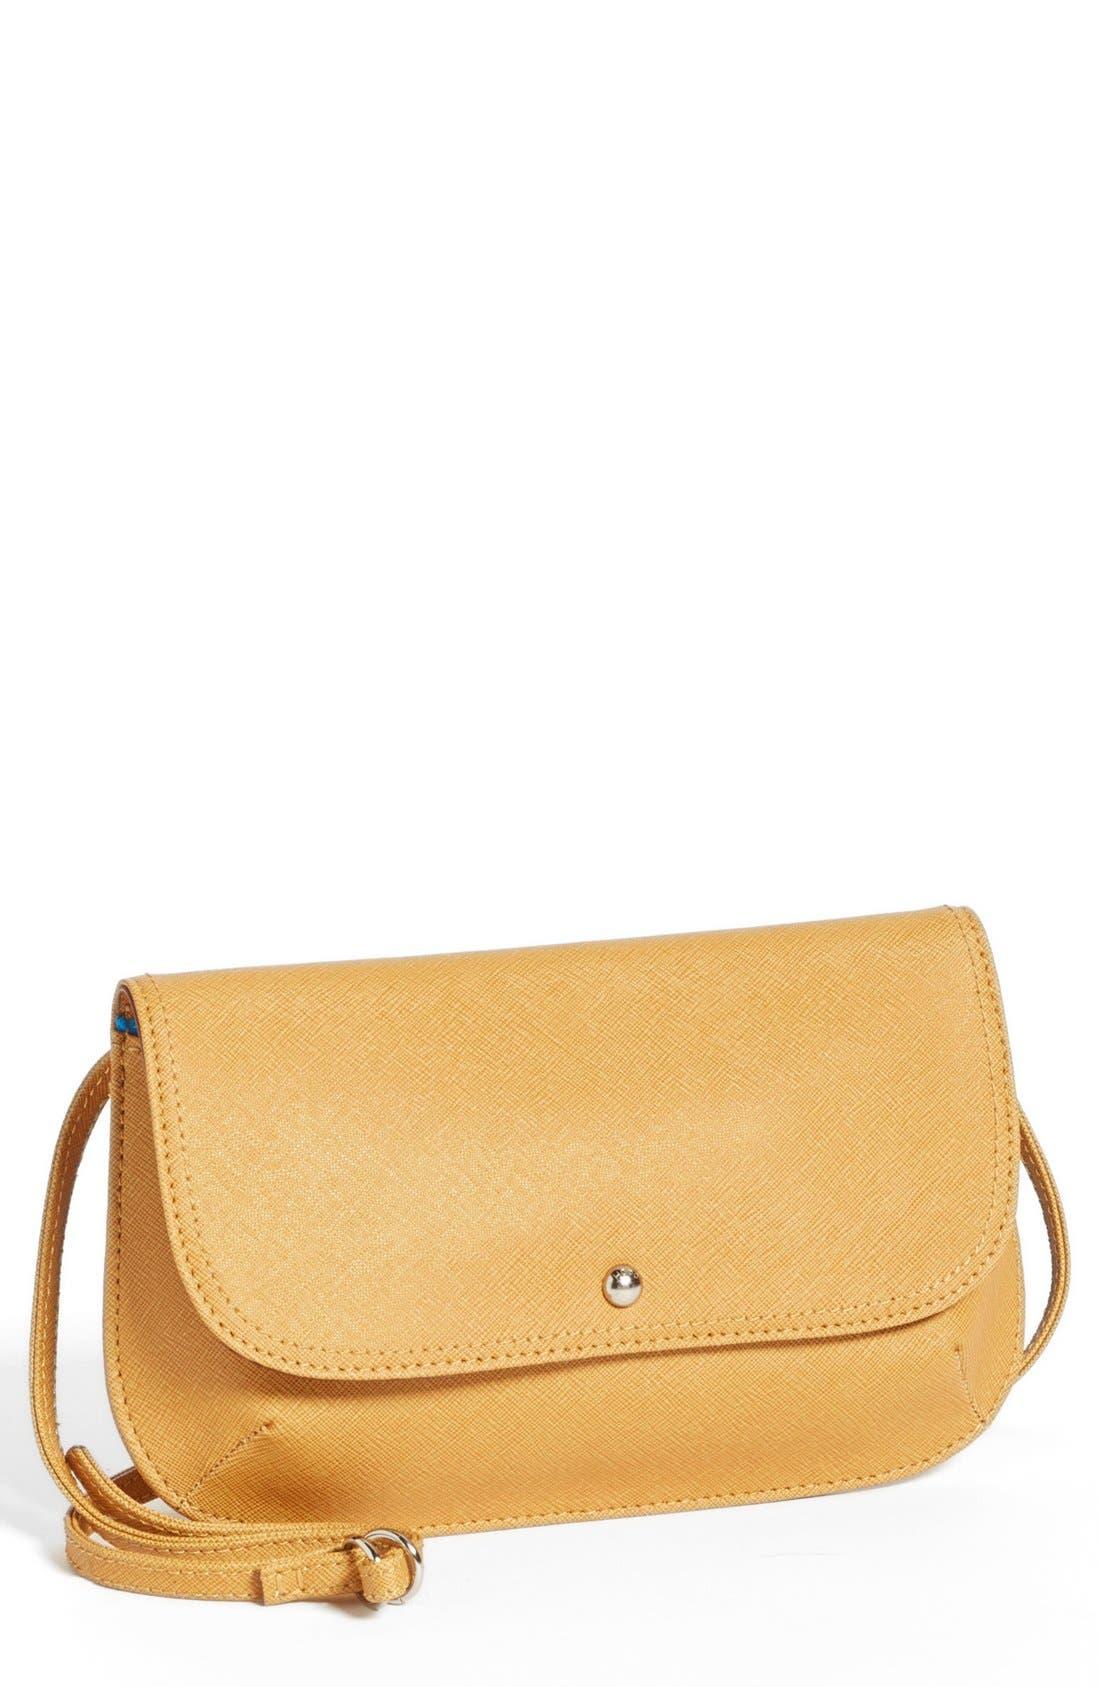 Main Image - Hobo 'Brigida' Bag